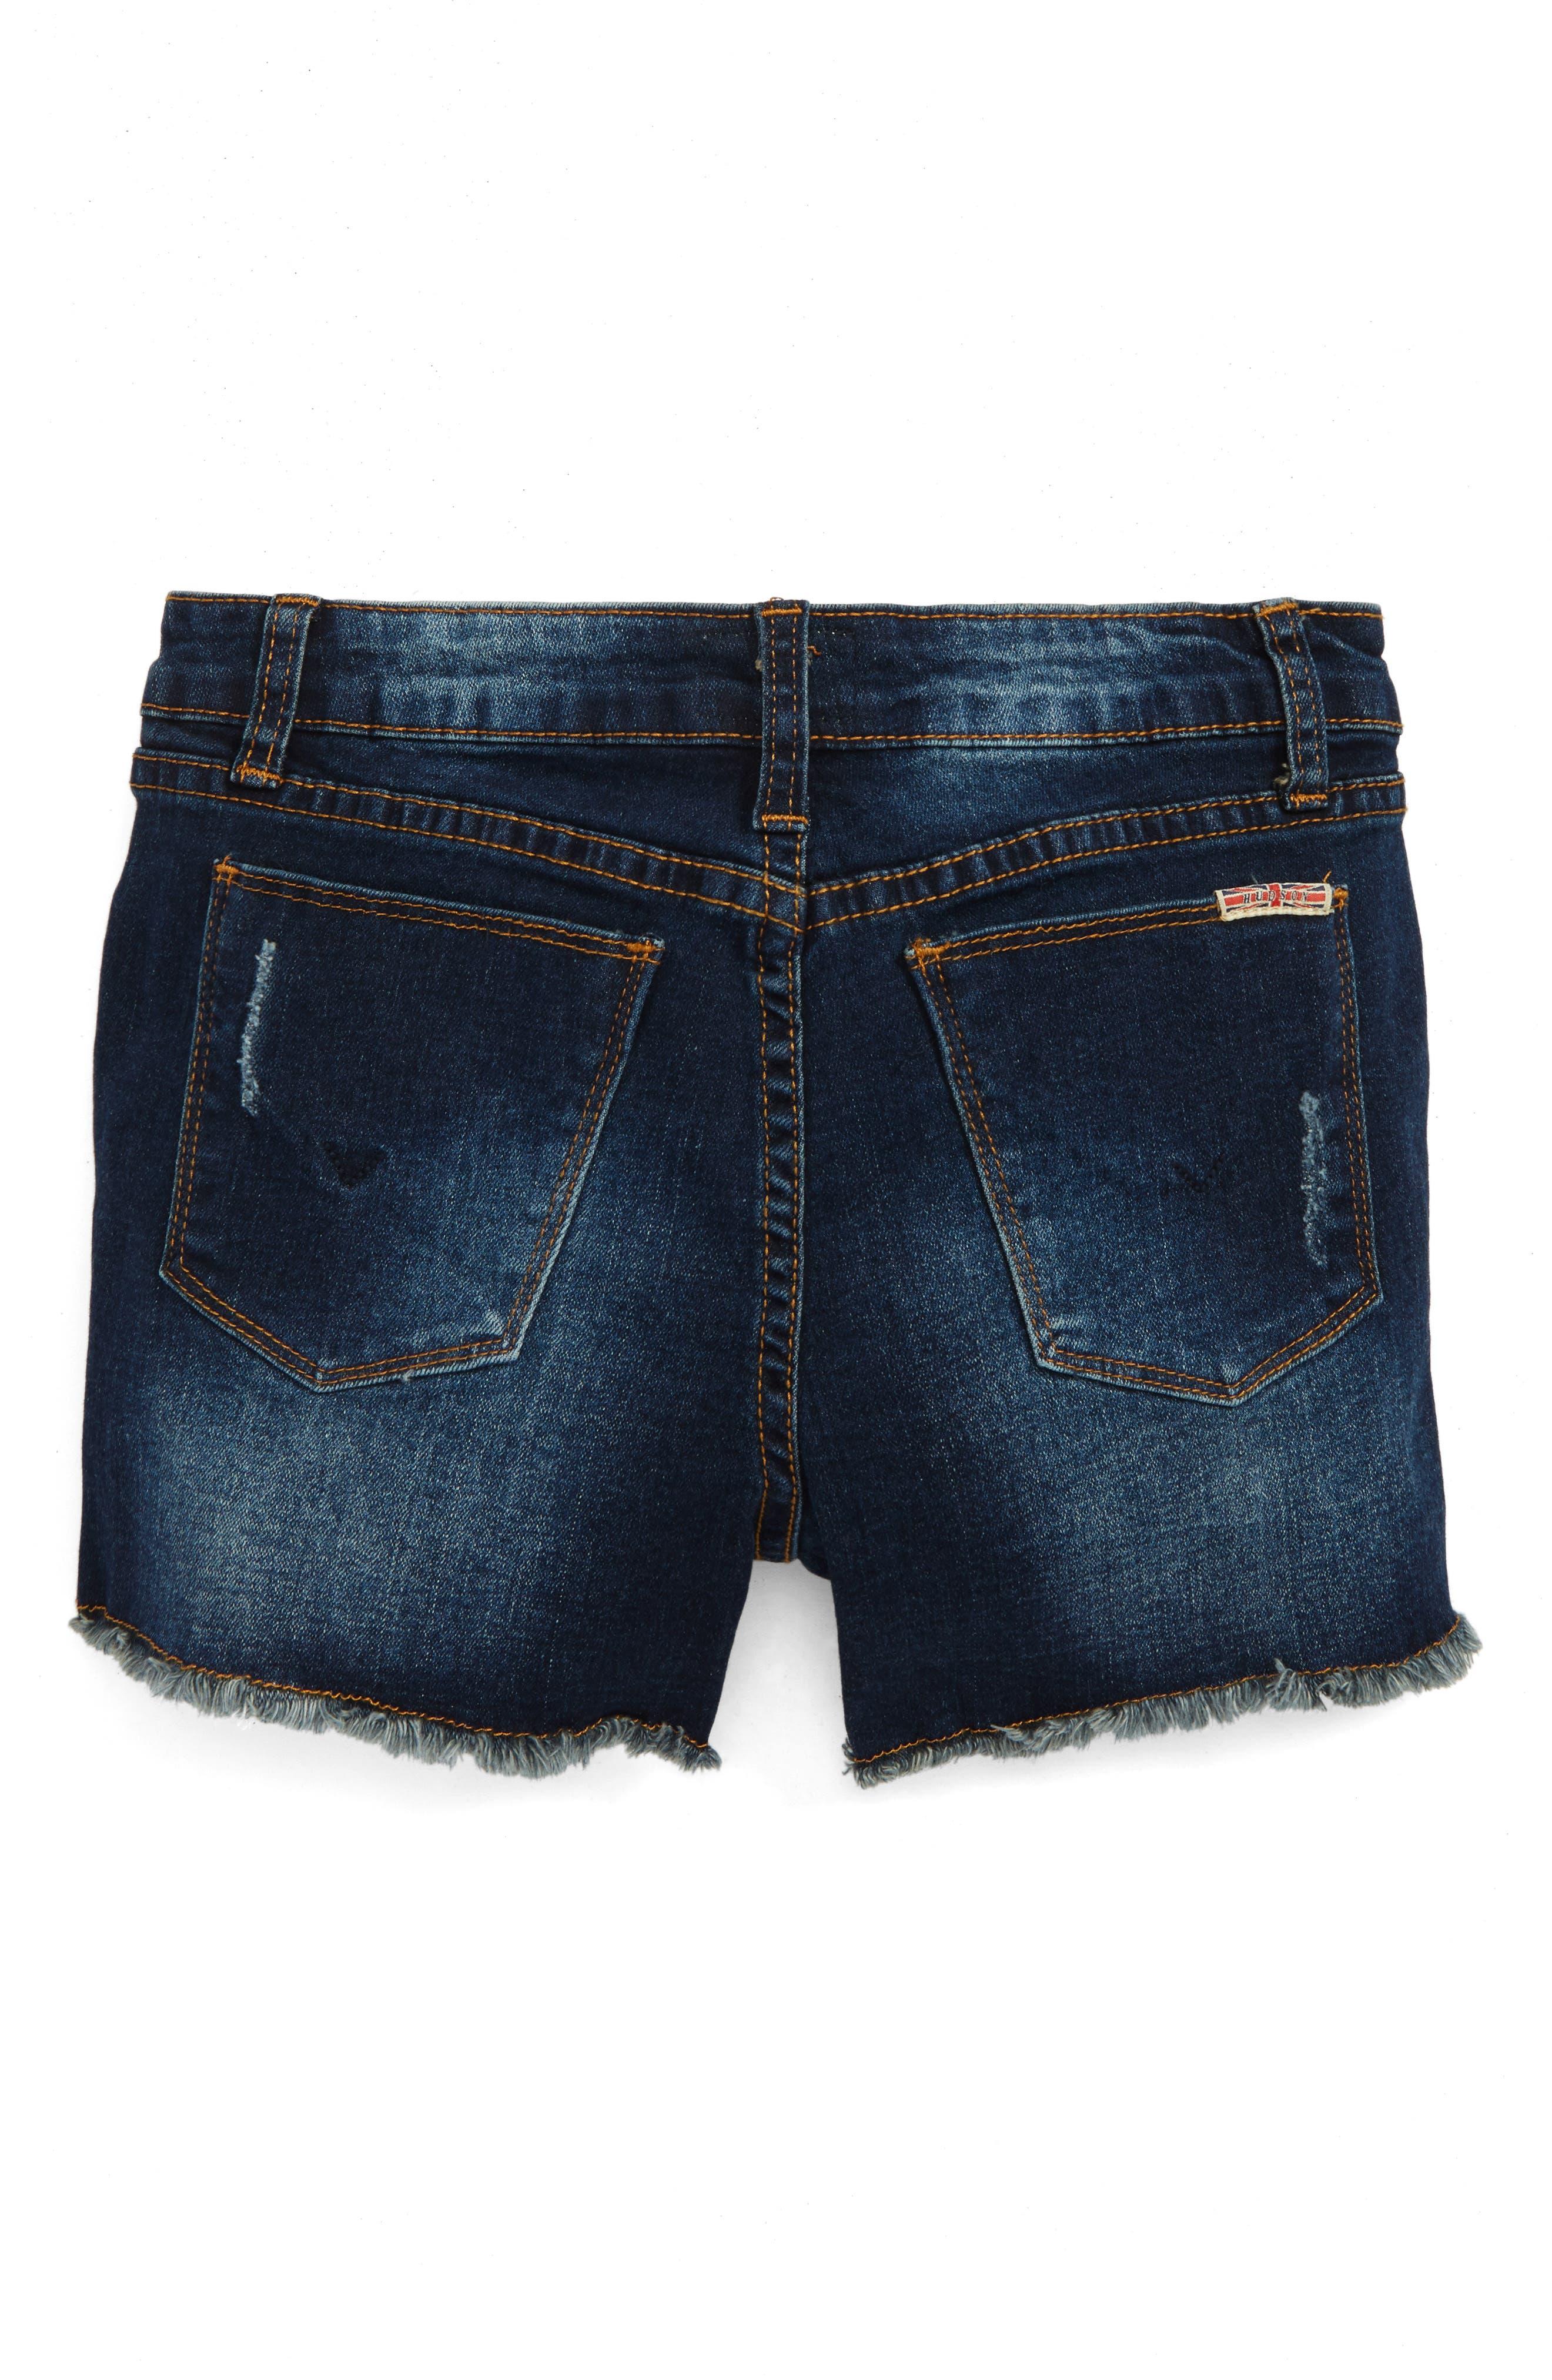 Alternate Image 1 Selected - Hudson Kids Frayed Shorts (Big Girls)